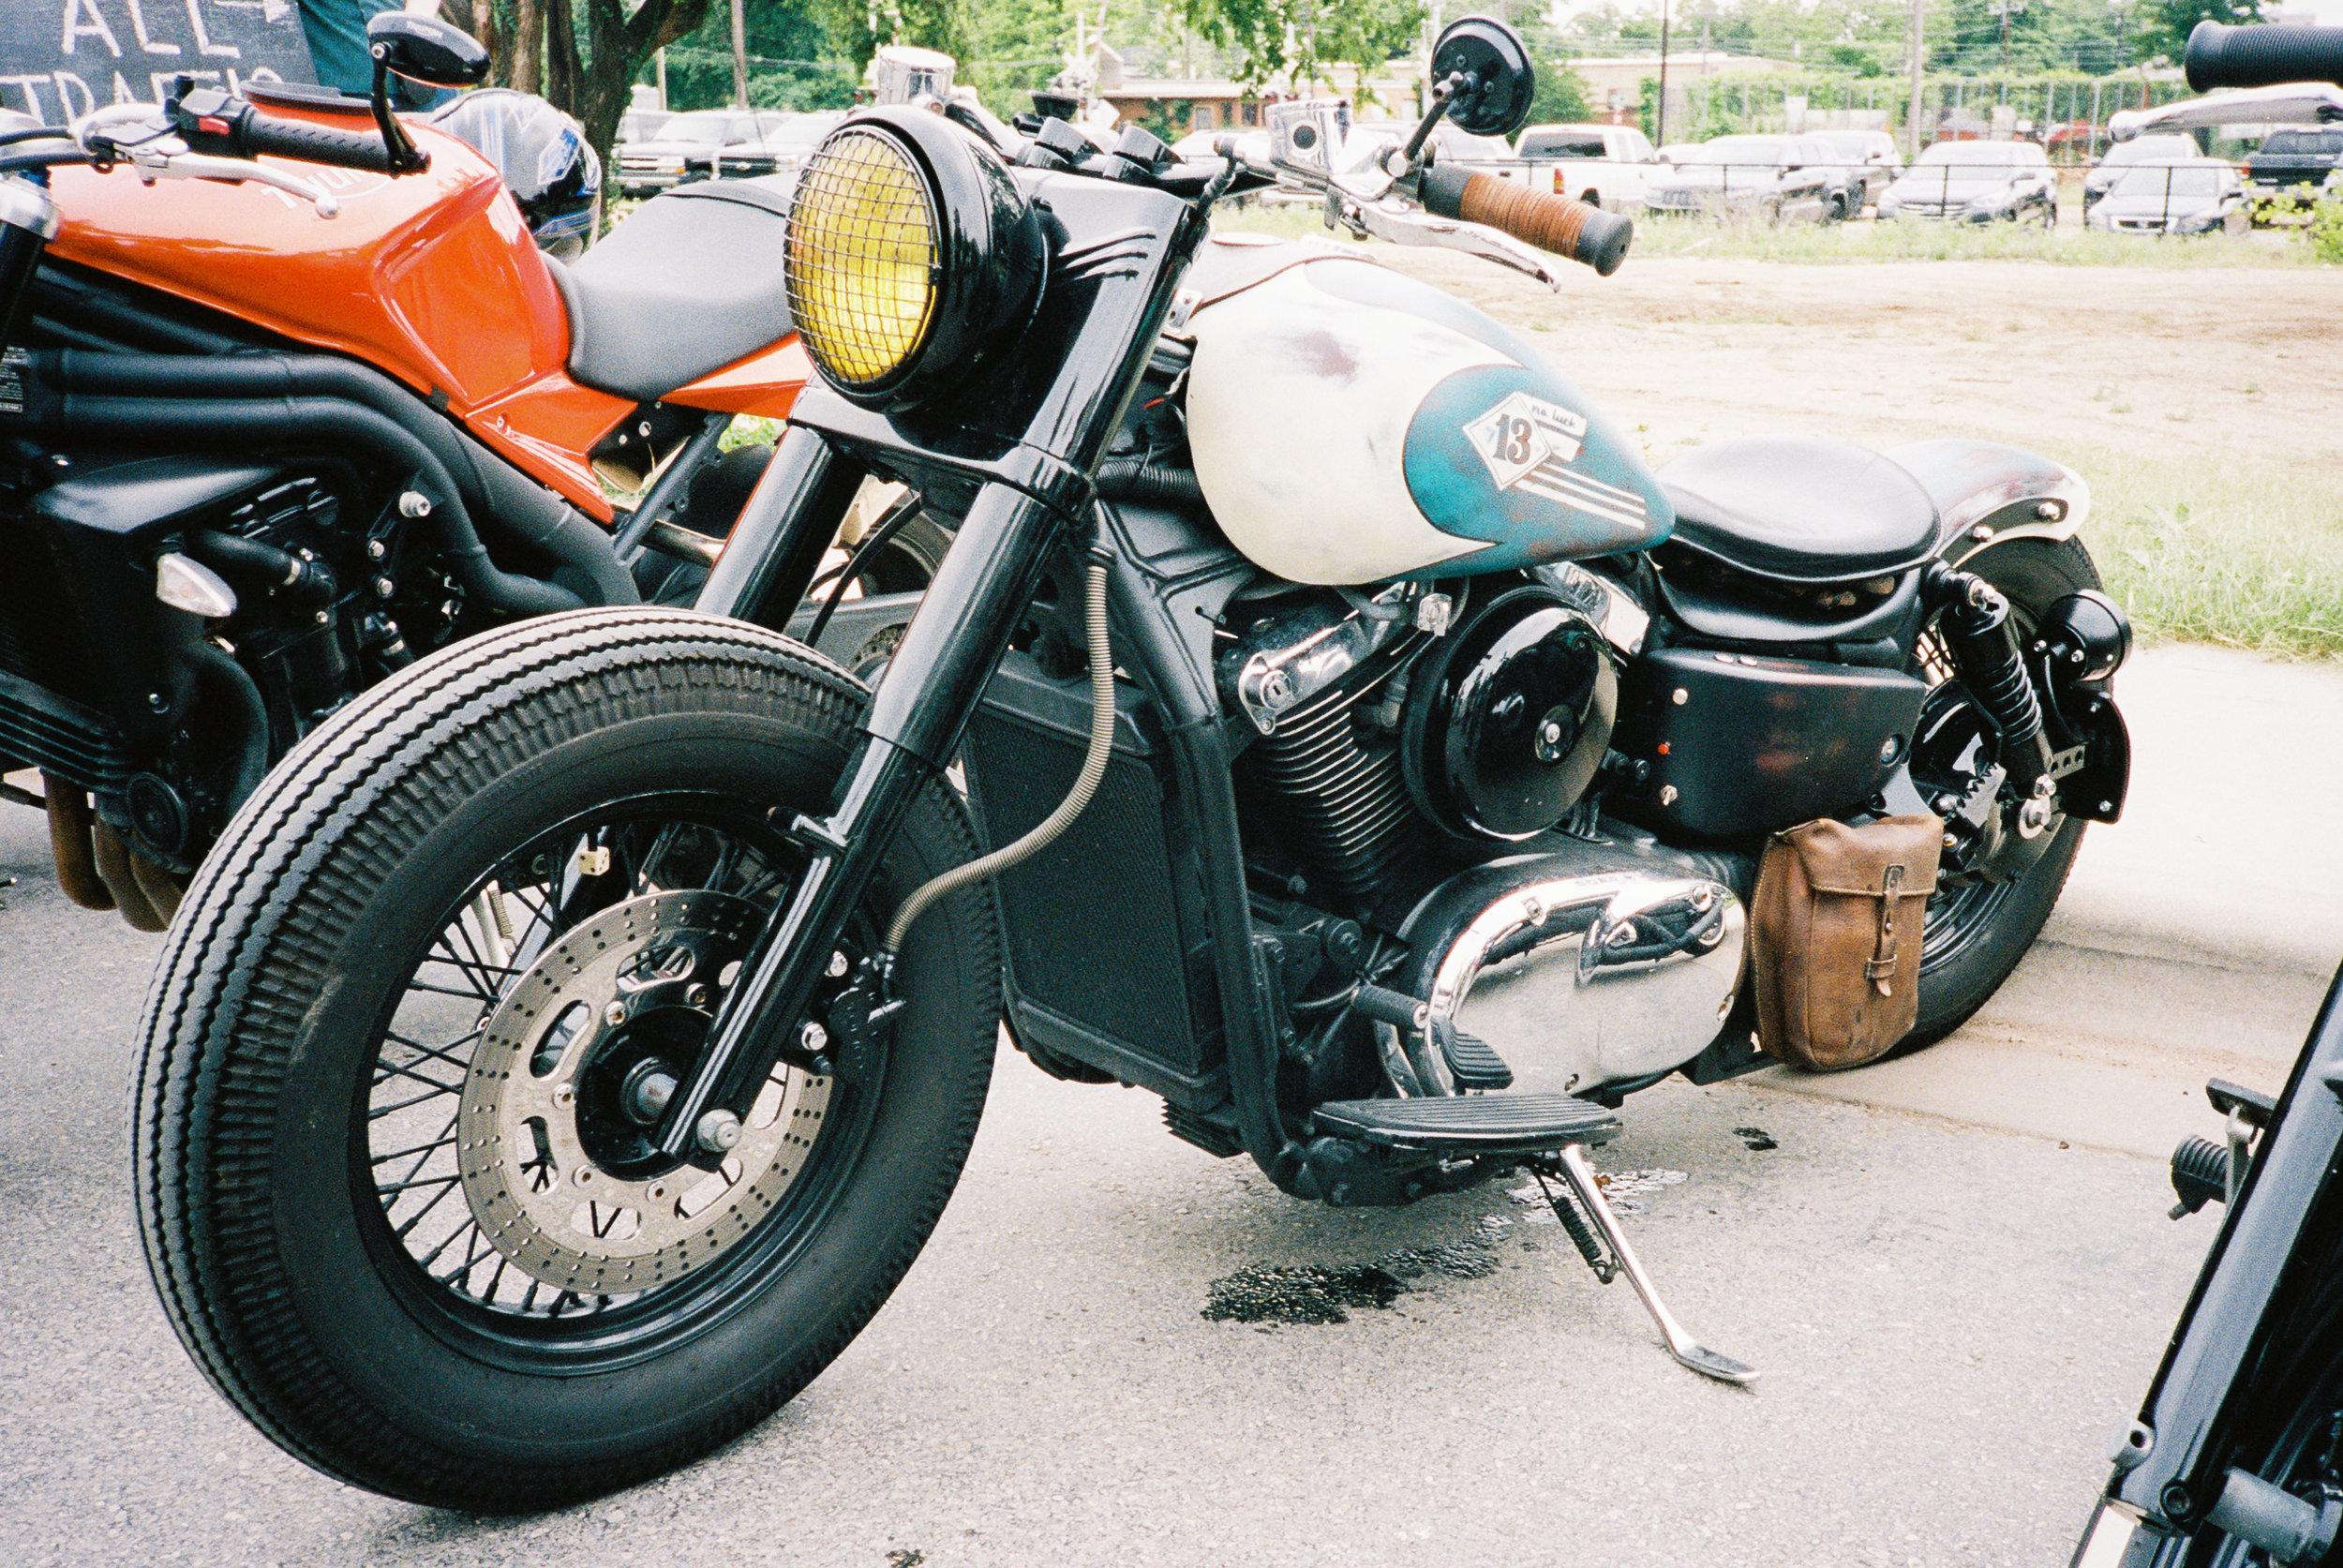 Handbuilt-Motorcycle-Show-2017--32.jpg